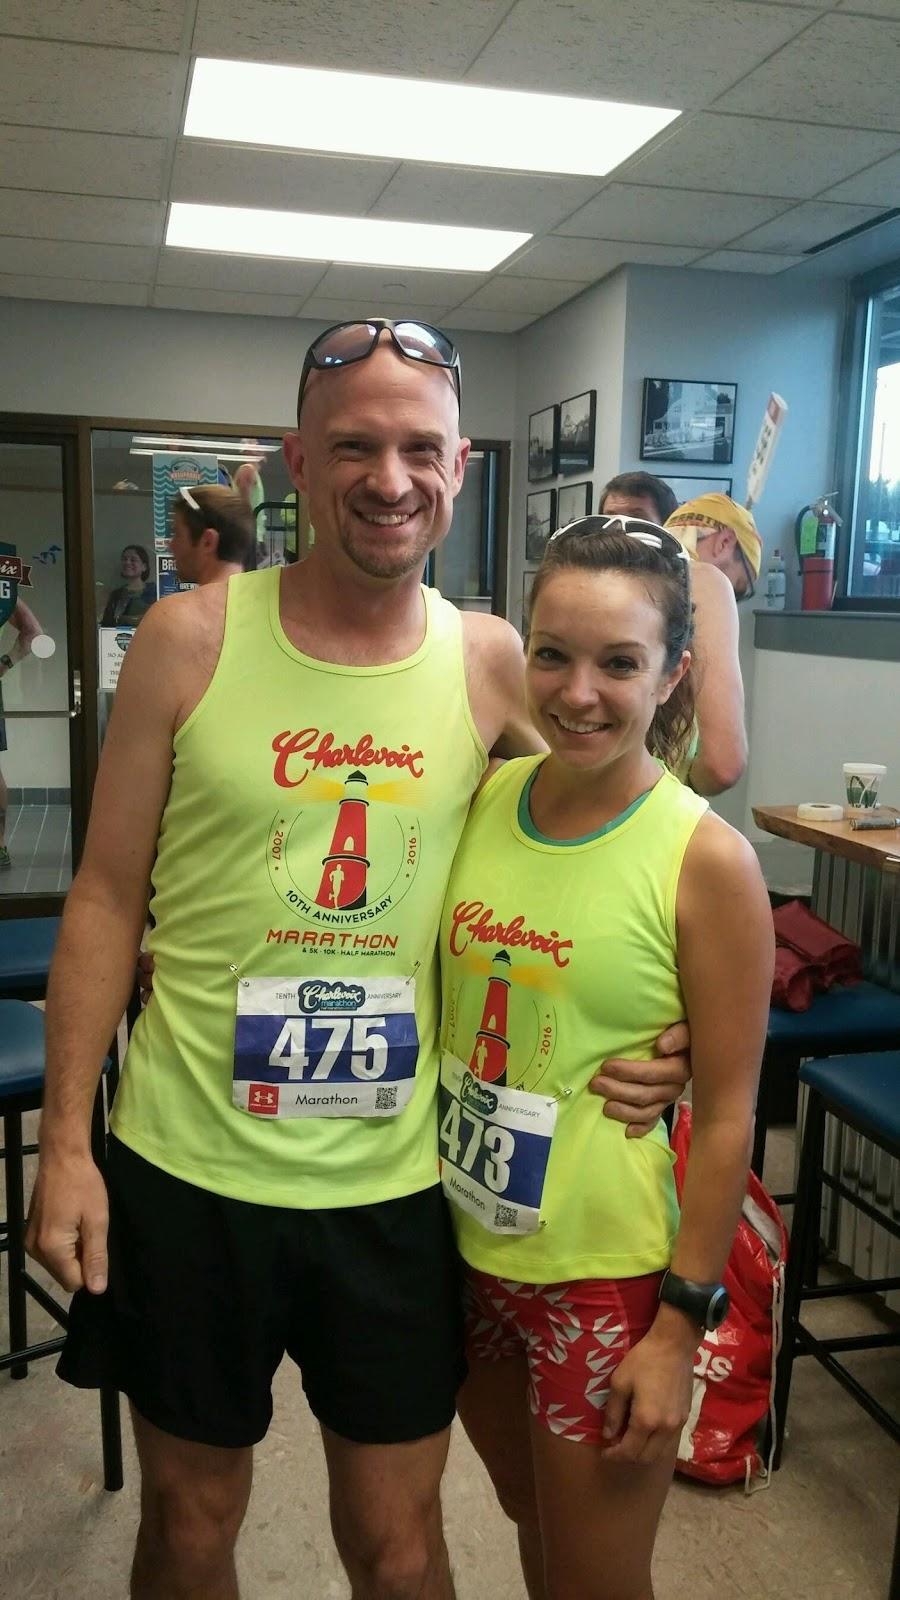 Steve & I pre-race. I still found a way to wear my favorite Oiselle shorts! /Photo courtesy Courtney Hansen.